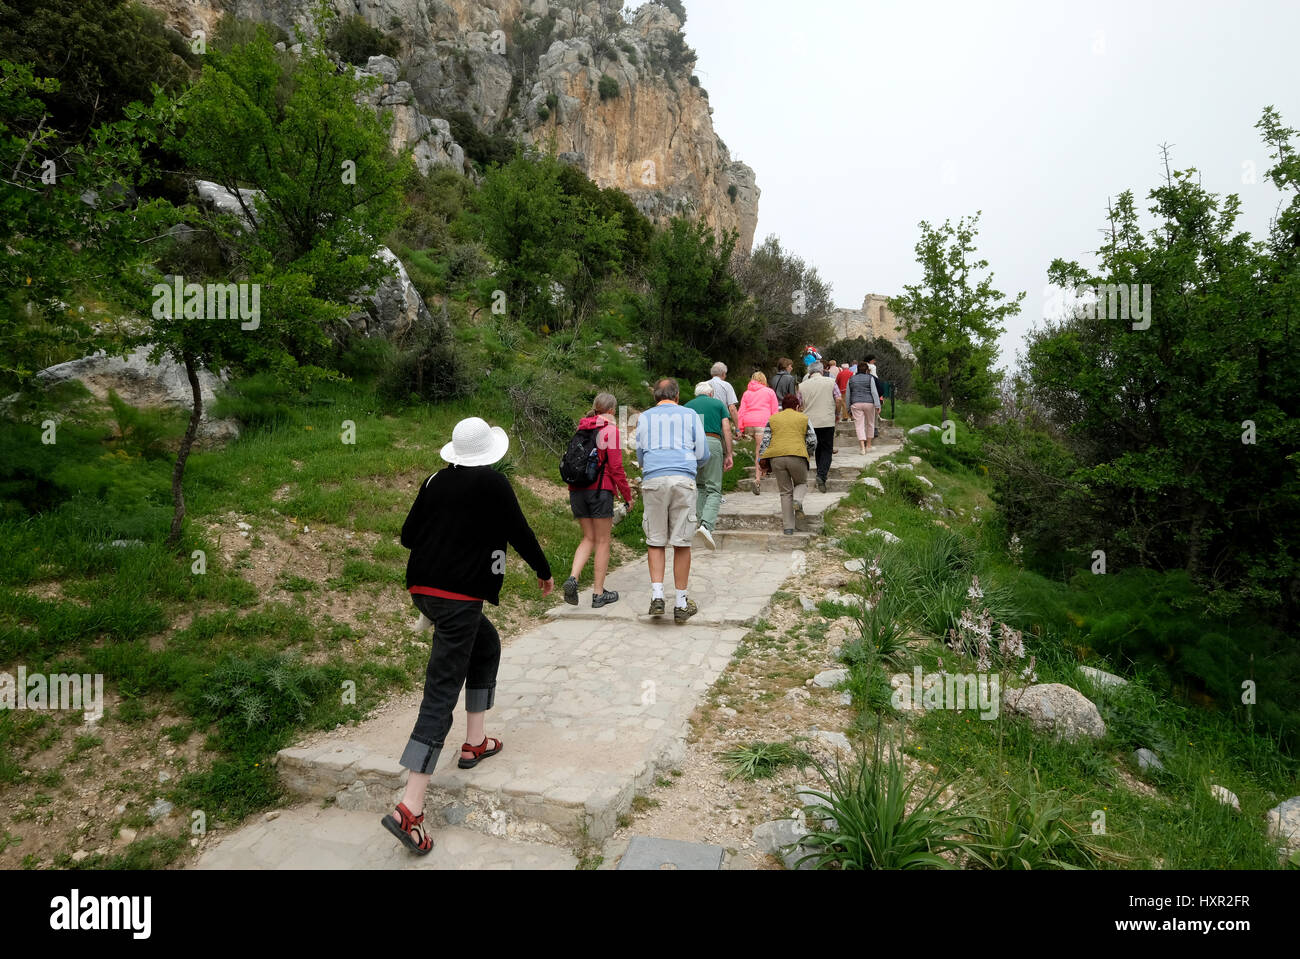 St Hilarion Castle, Kyrenia, Northern Cyprus. - Stock Image